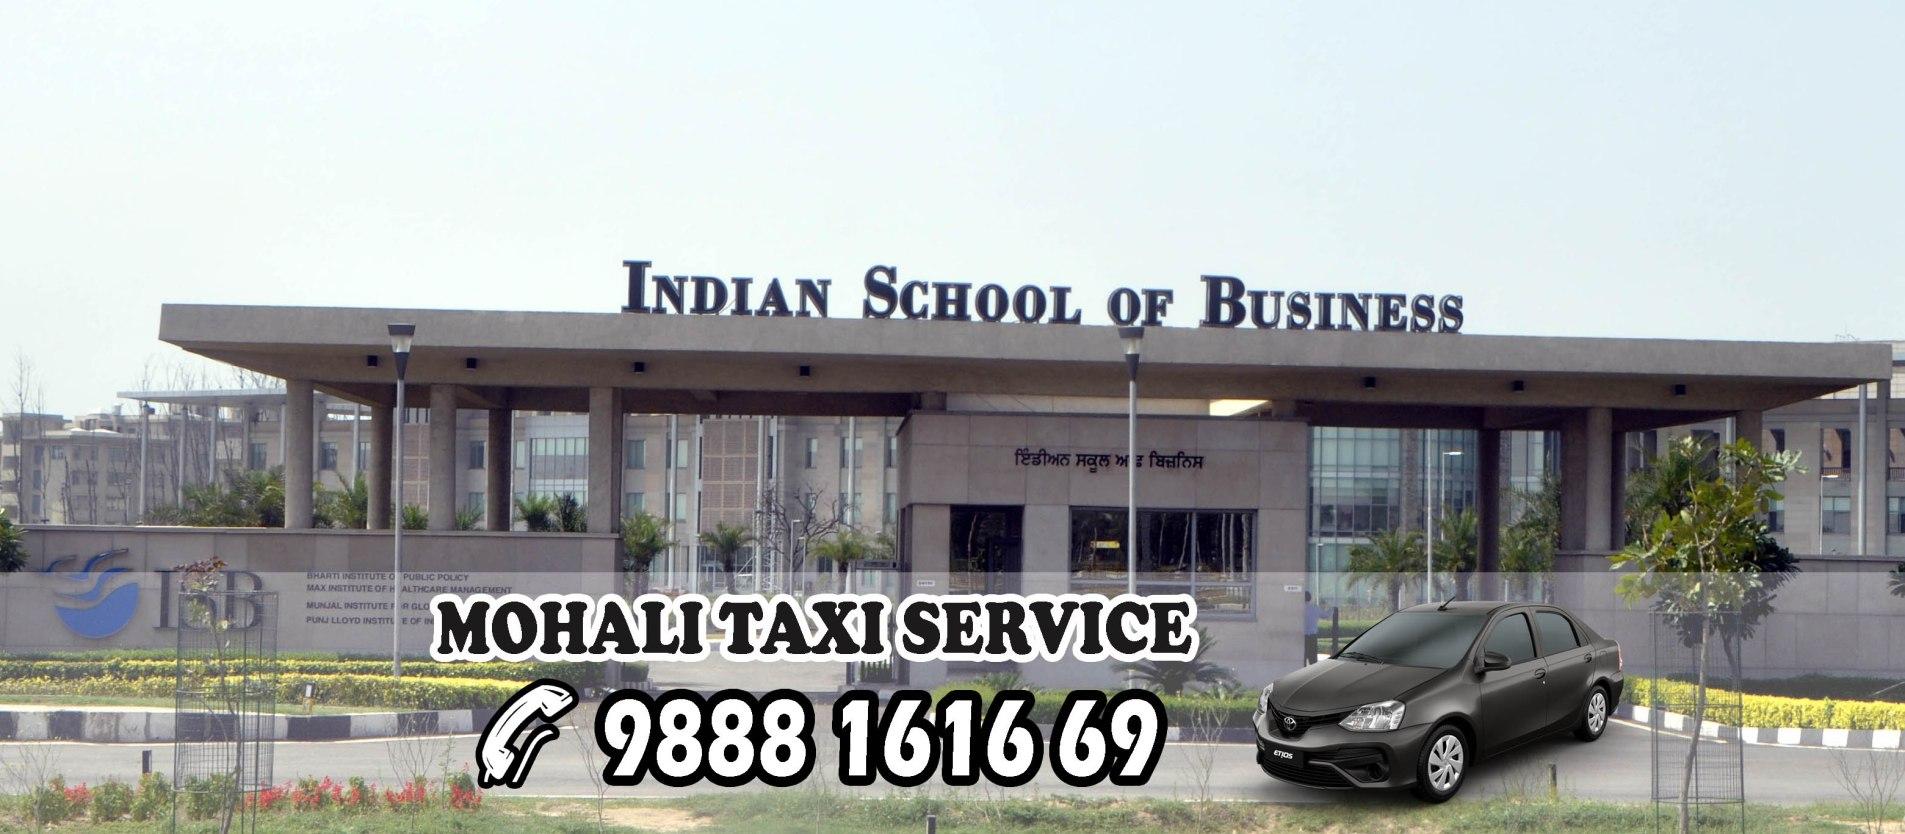 mohali taxi service